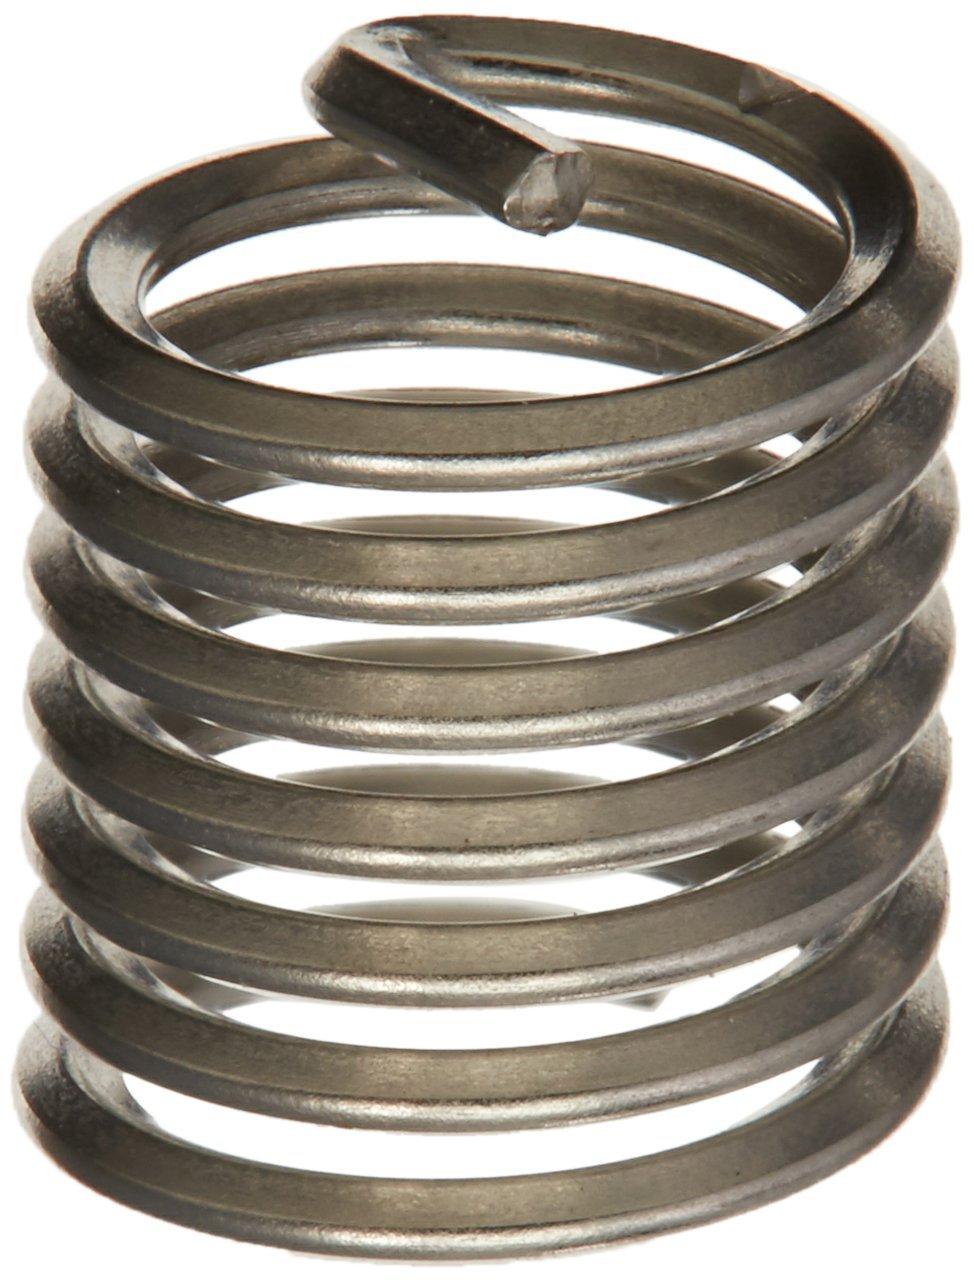 Heli-Coil R11913 10-32 Inserts/Pk 12